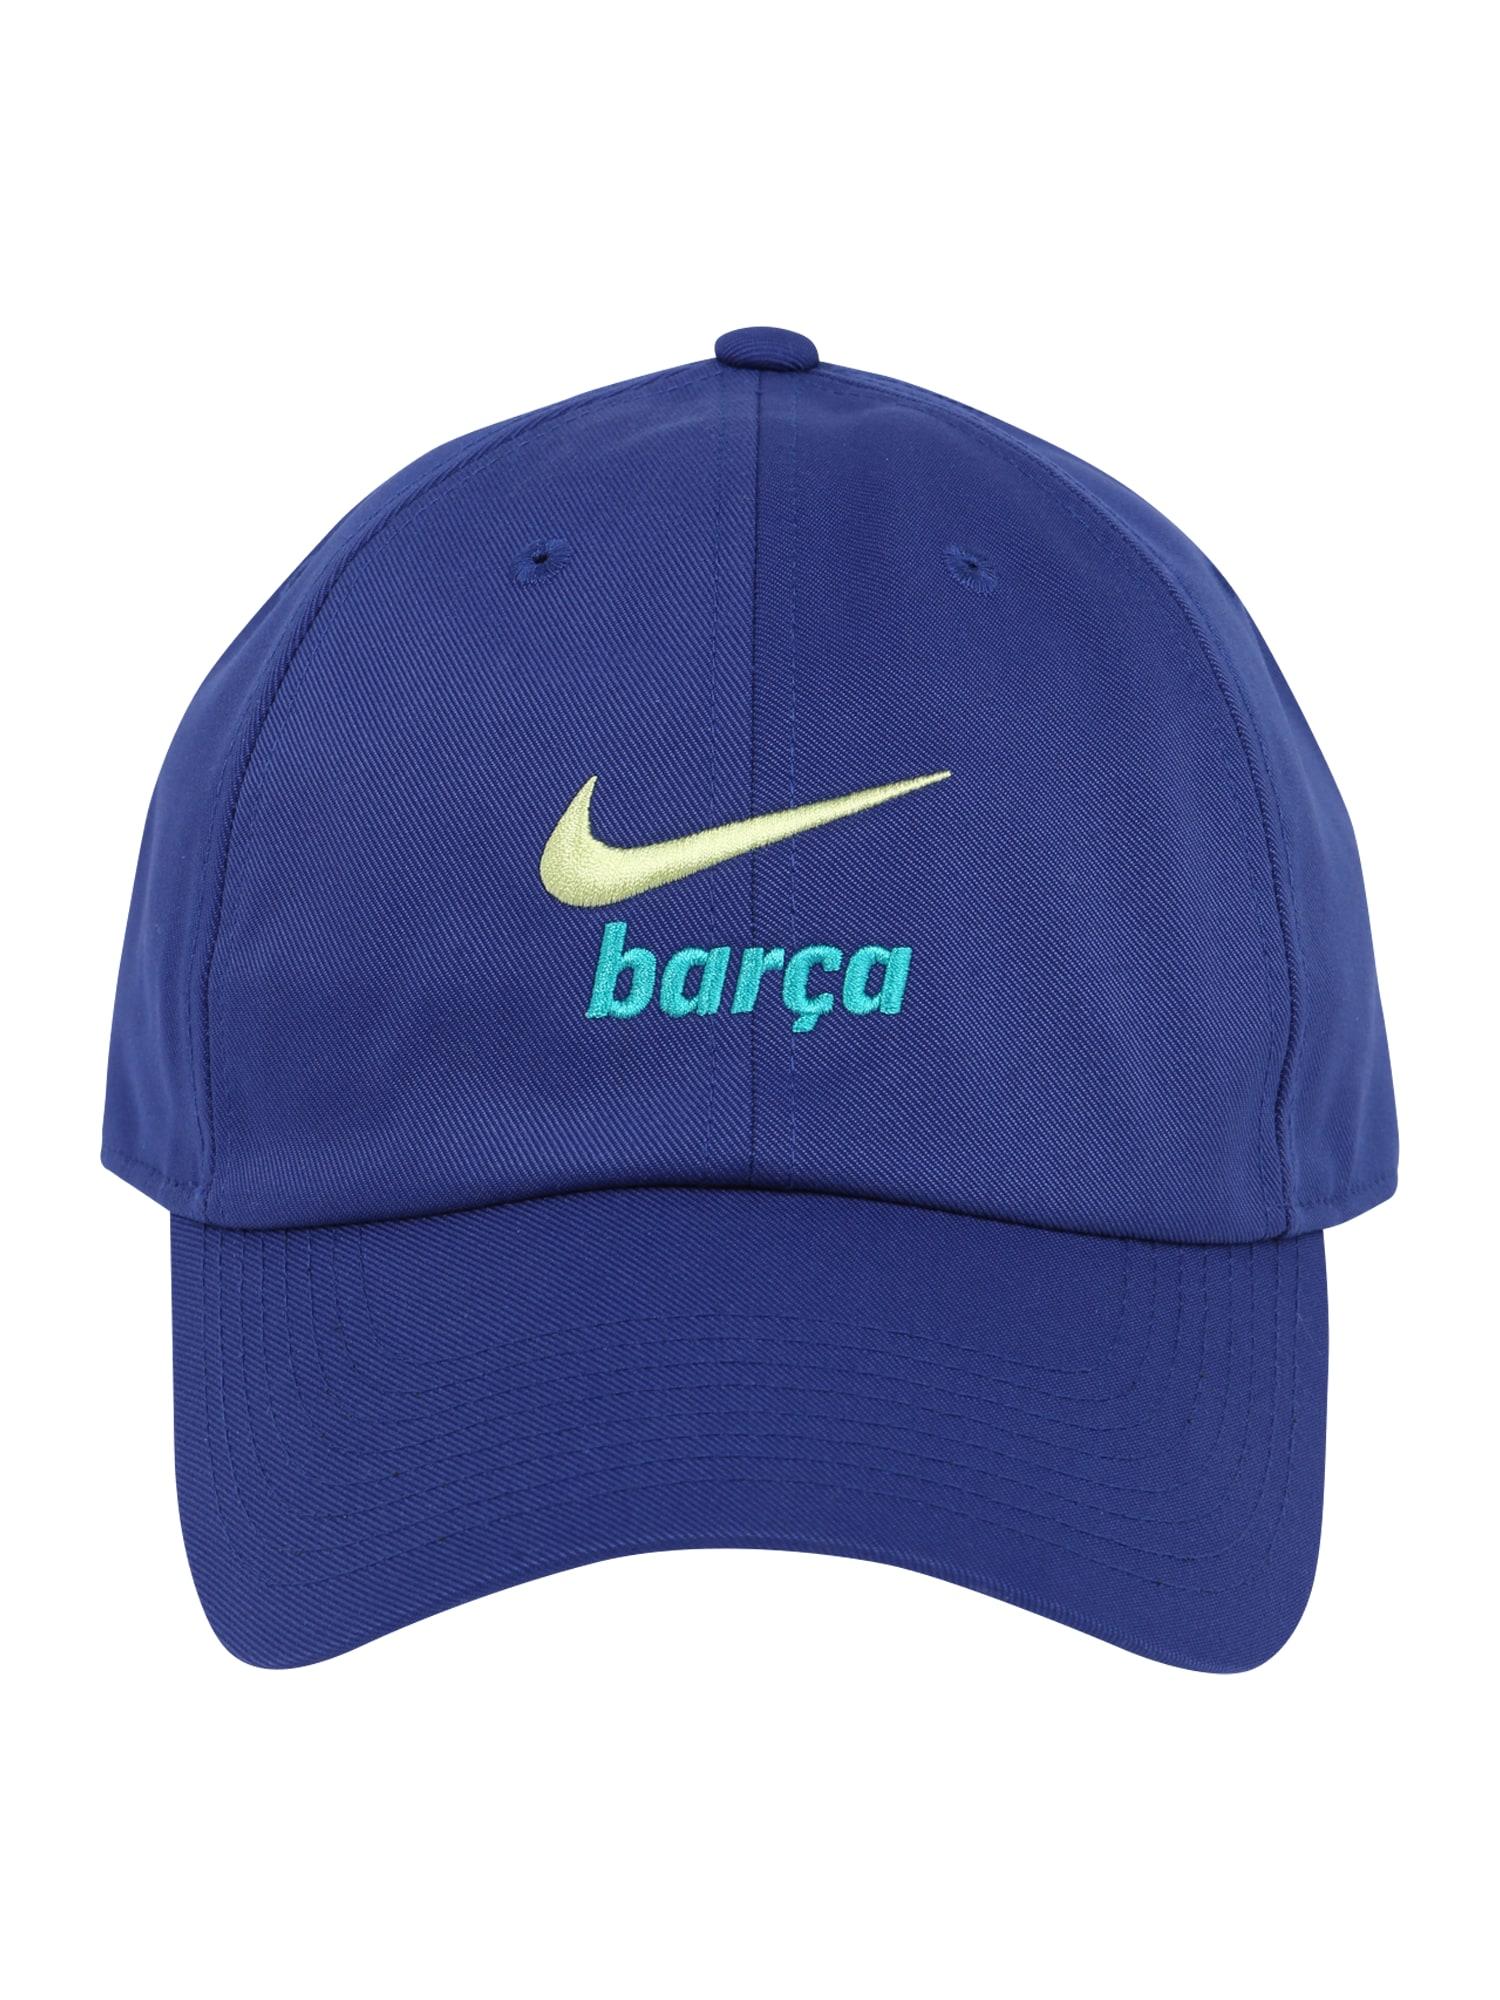 NIKE Sportovní kšiltovka 'BLAUGDI'  královská modrá / bílá / aqua modrá